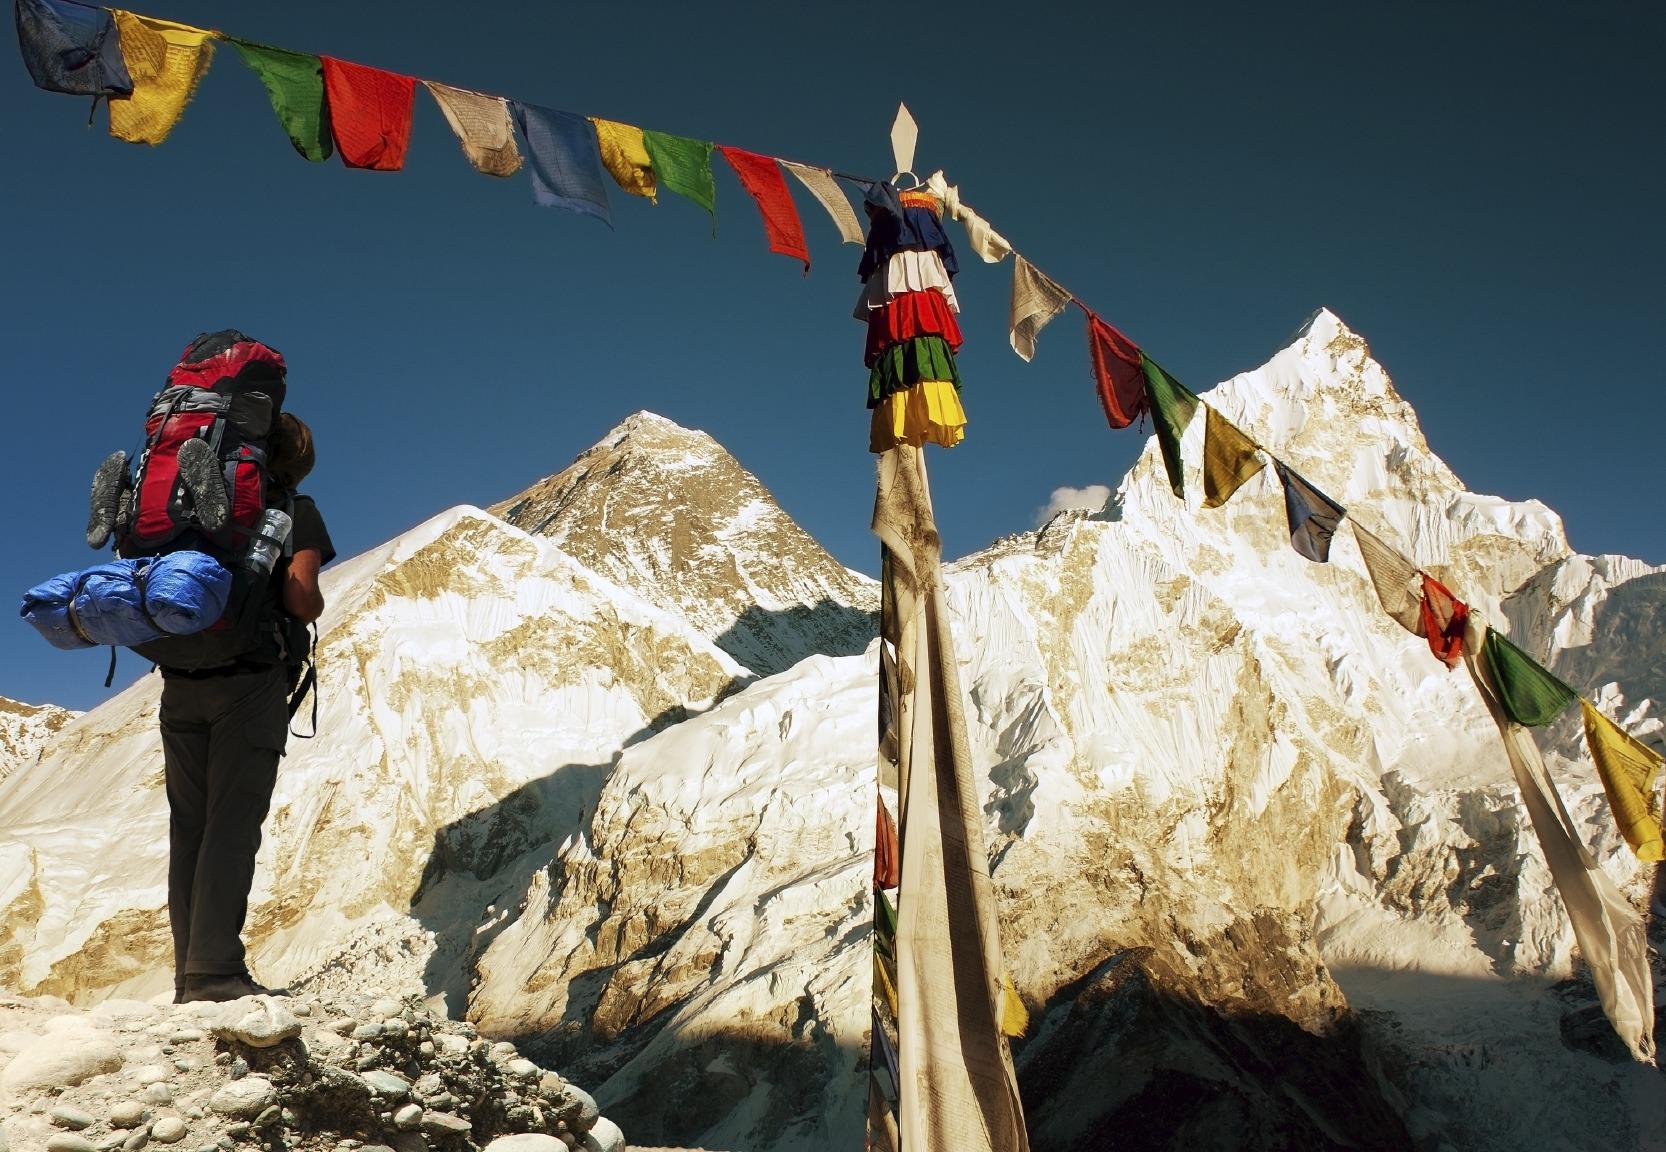 everest-base-camp-nepal.jpg